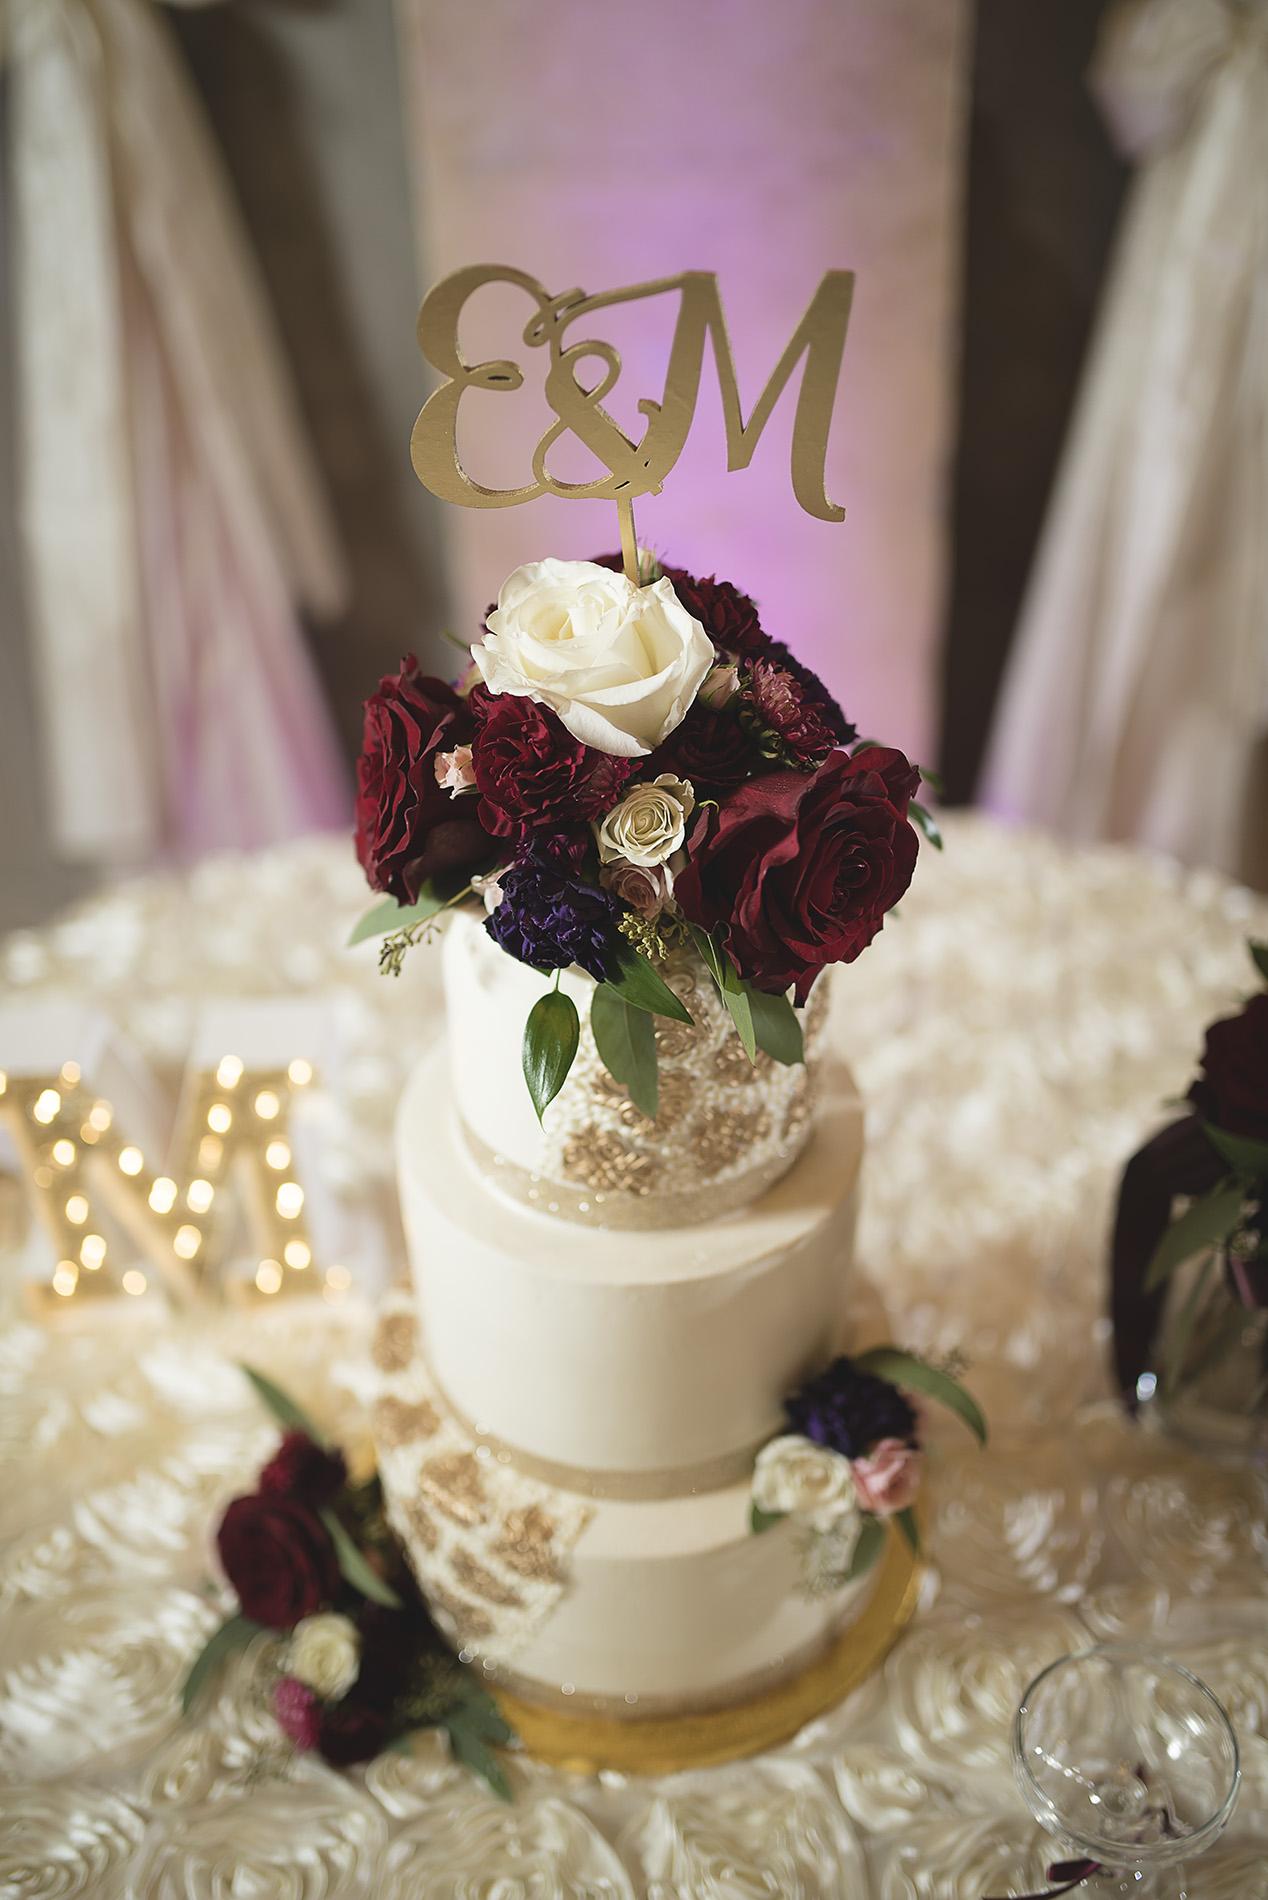 Houston-venue-Olde-Dobbin-Station-Romantic-Classic-Wedding-Photographer-101.jpg